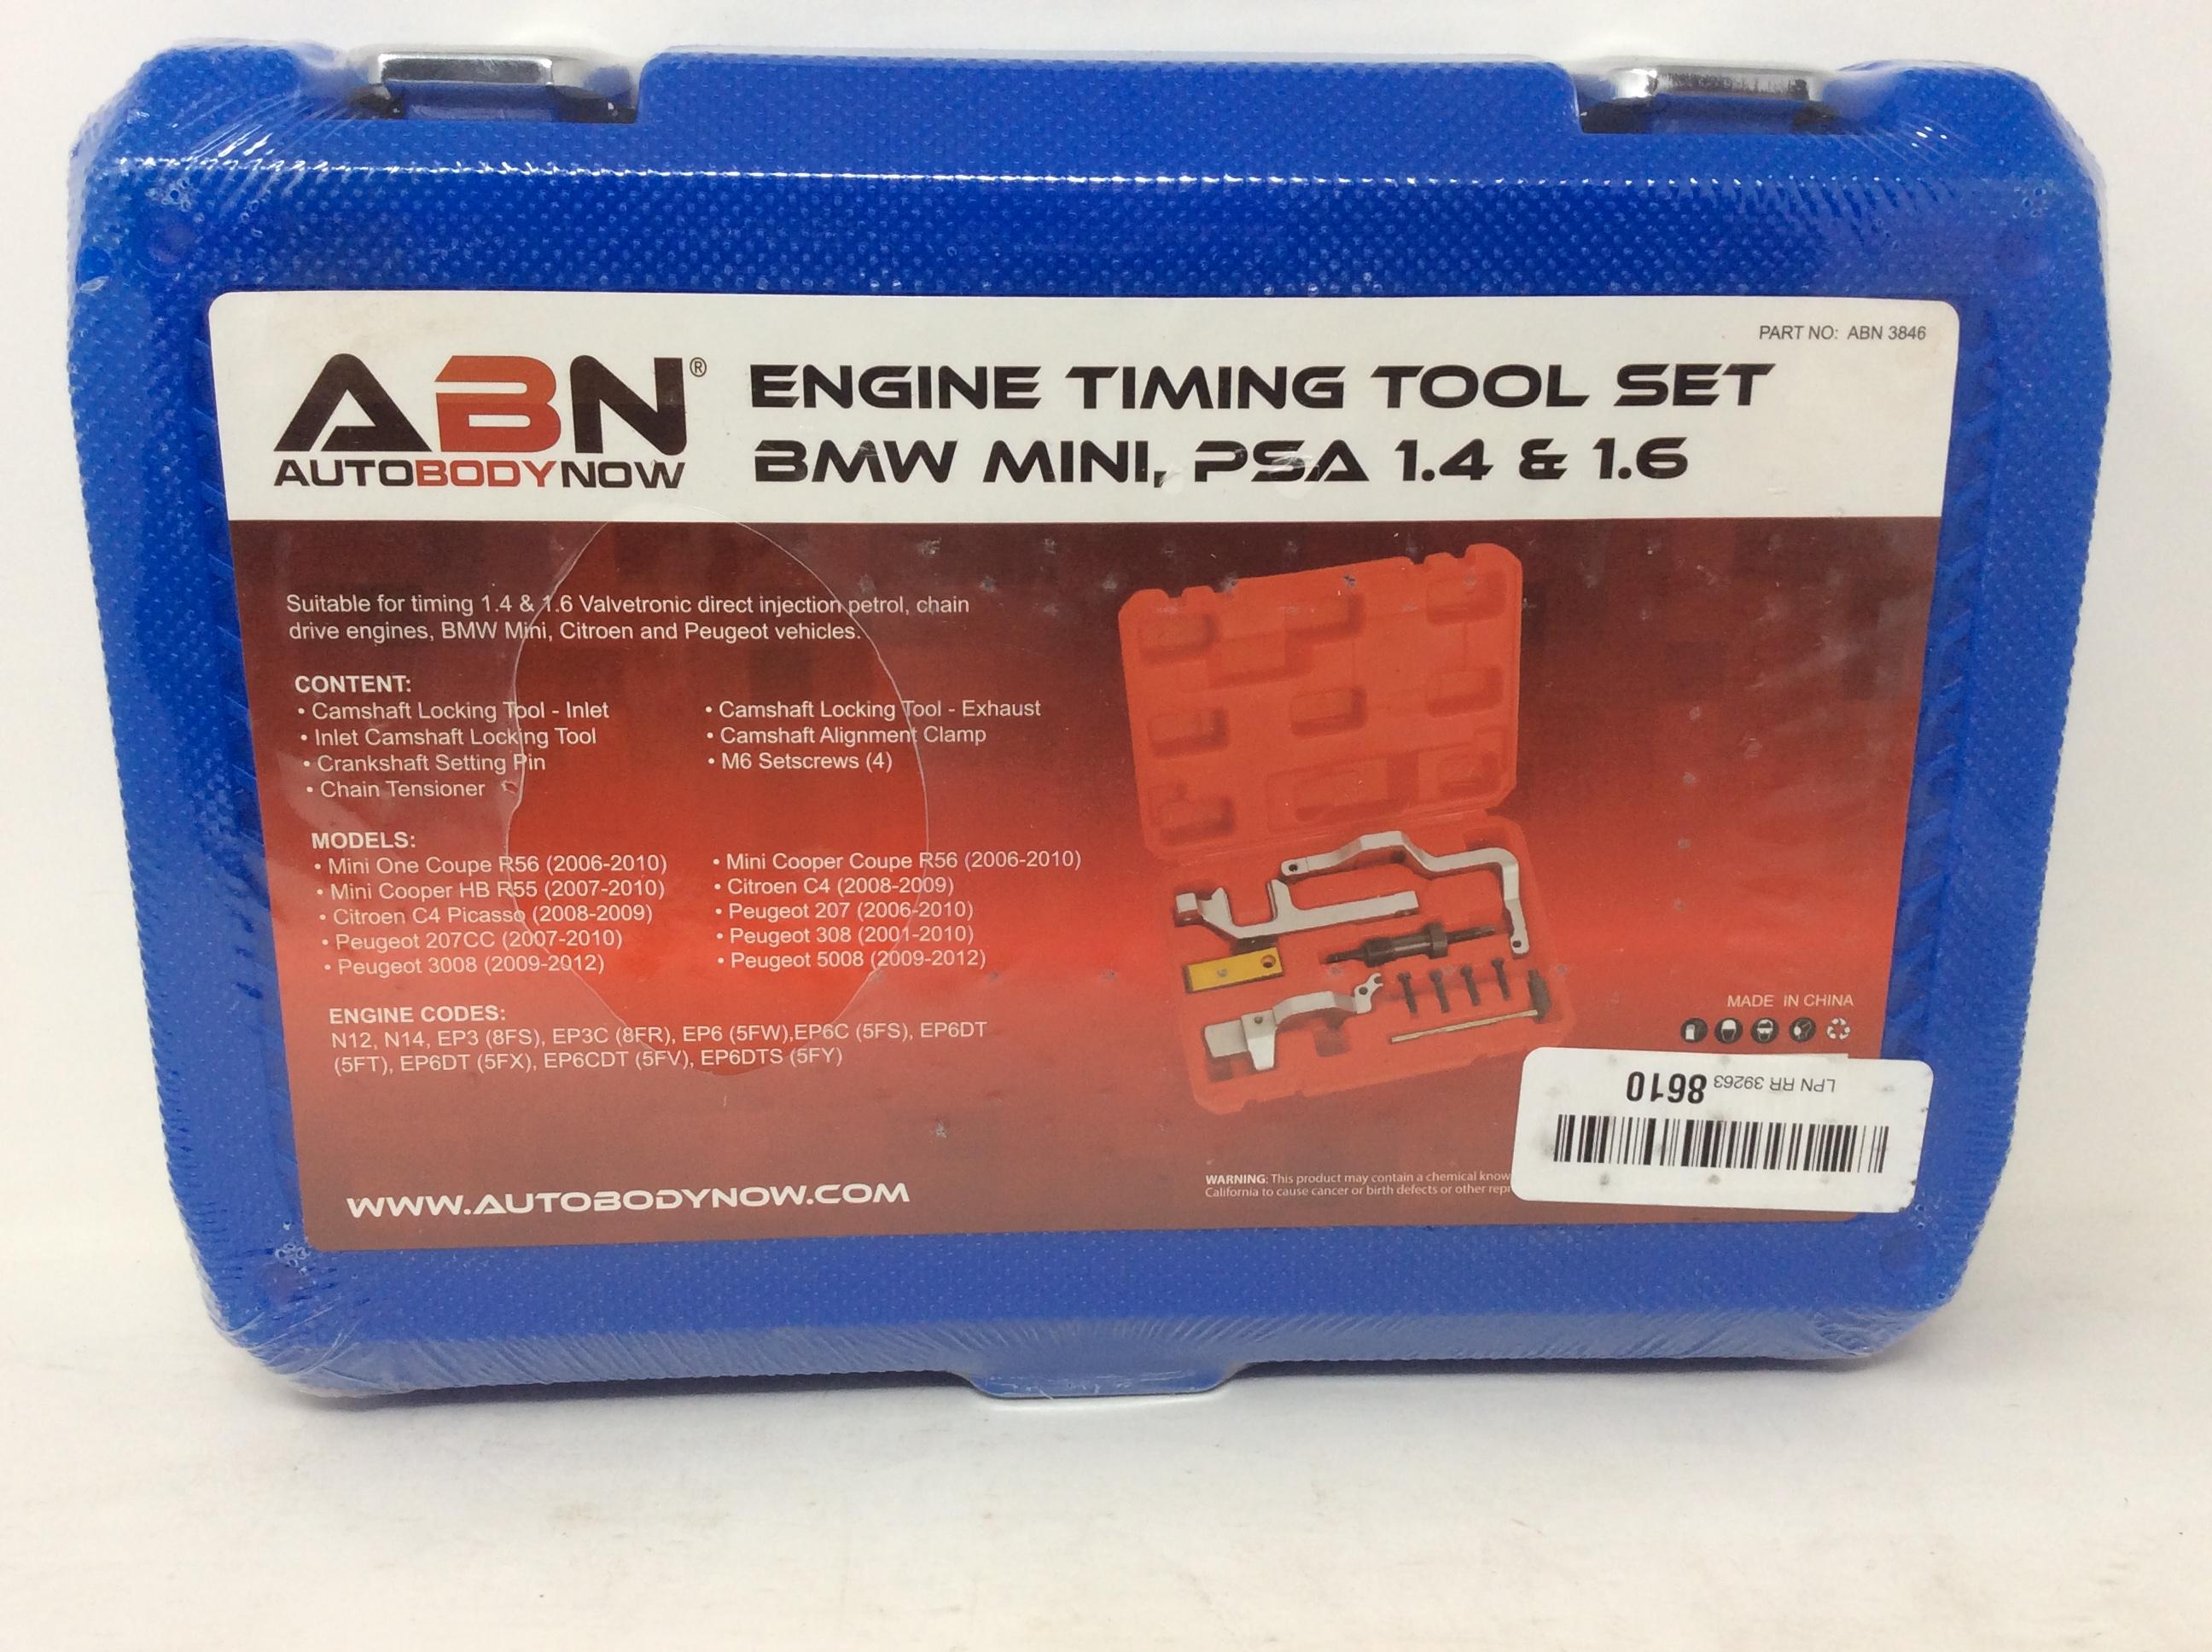 ABN Engine Timing Tool Set for Mini Cooper N12 Citroen N14 BMW Peugeot